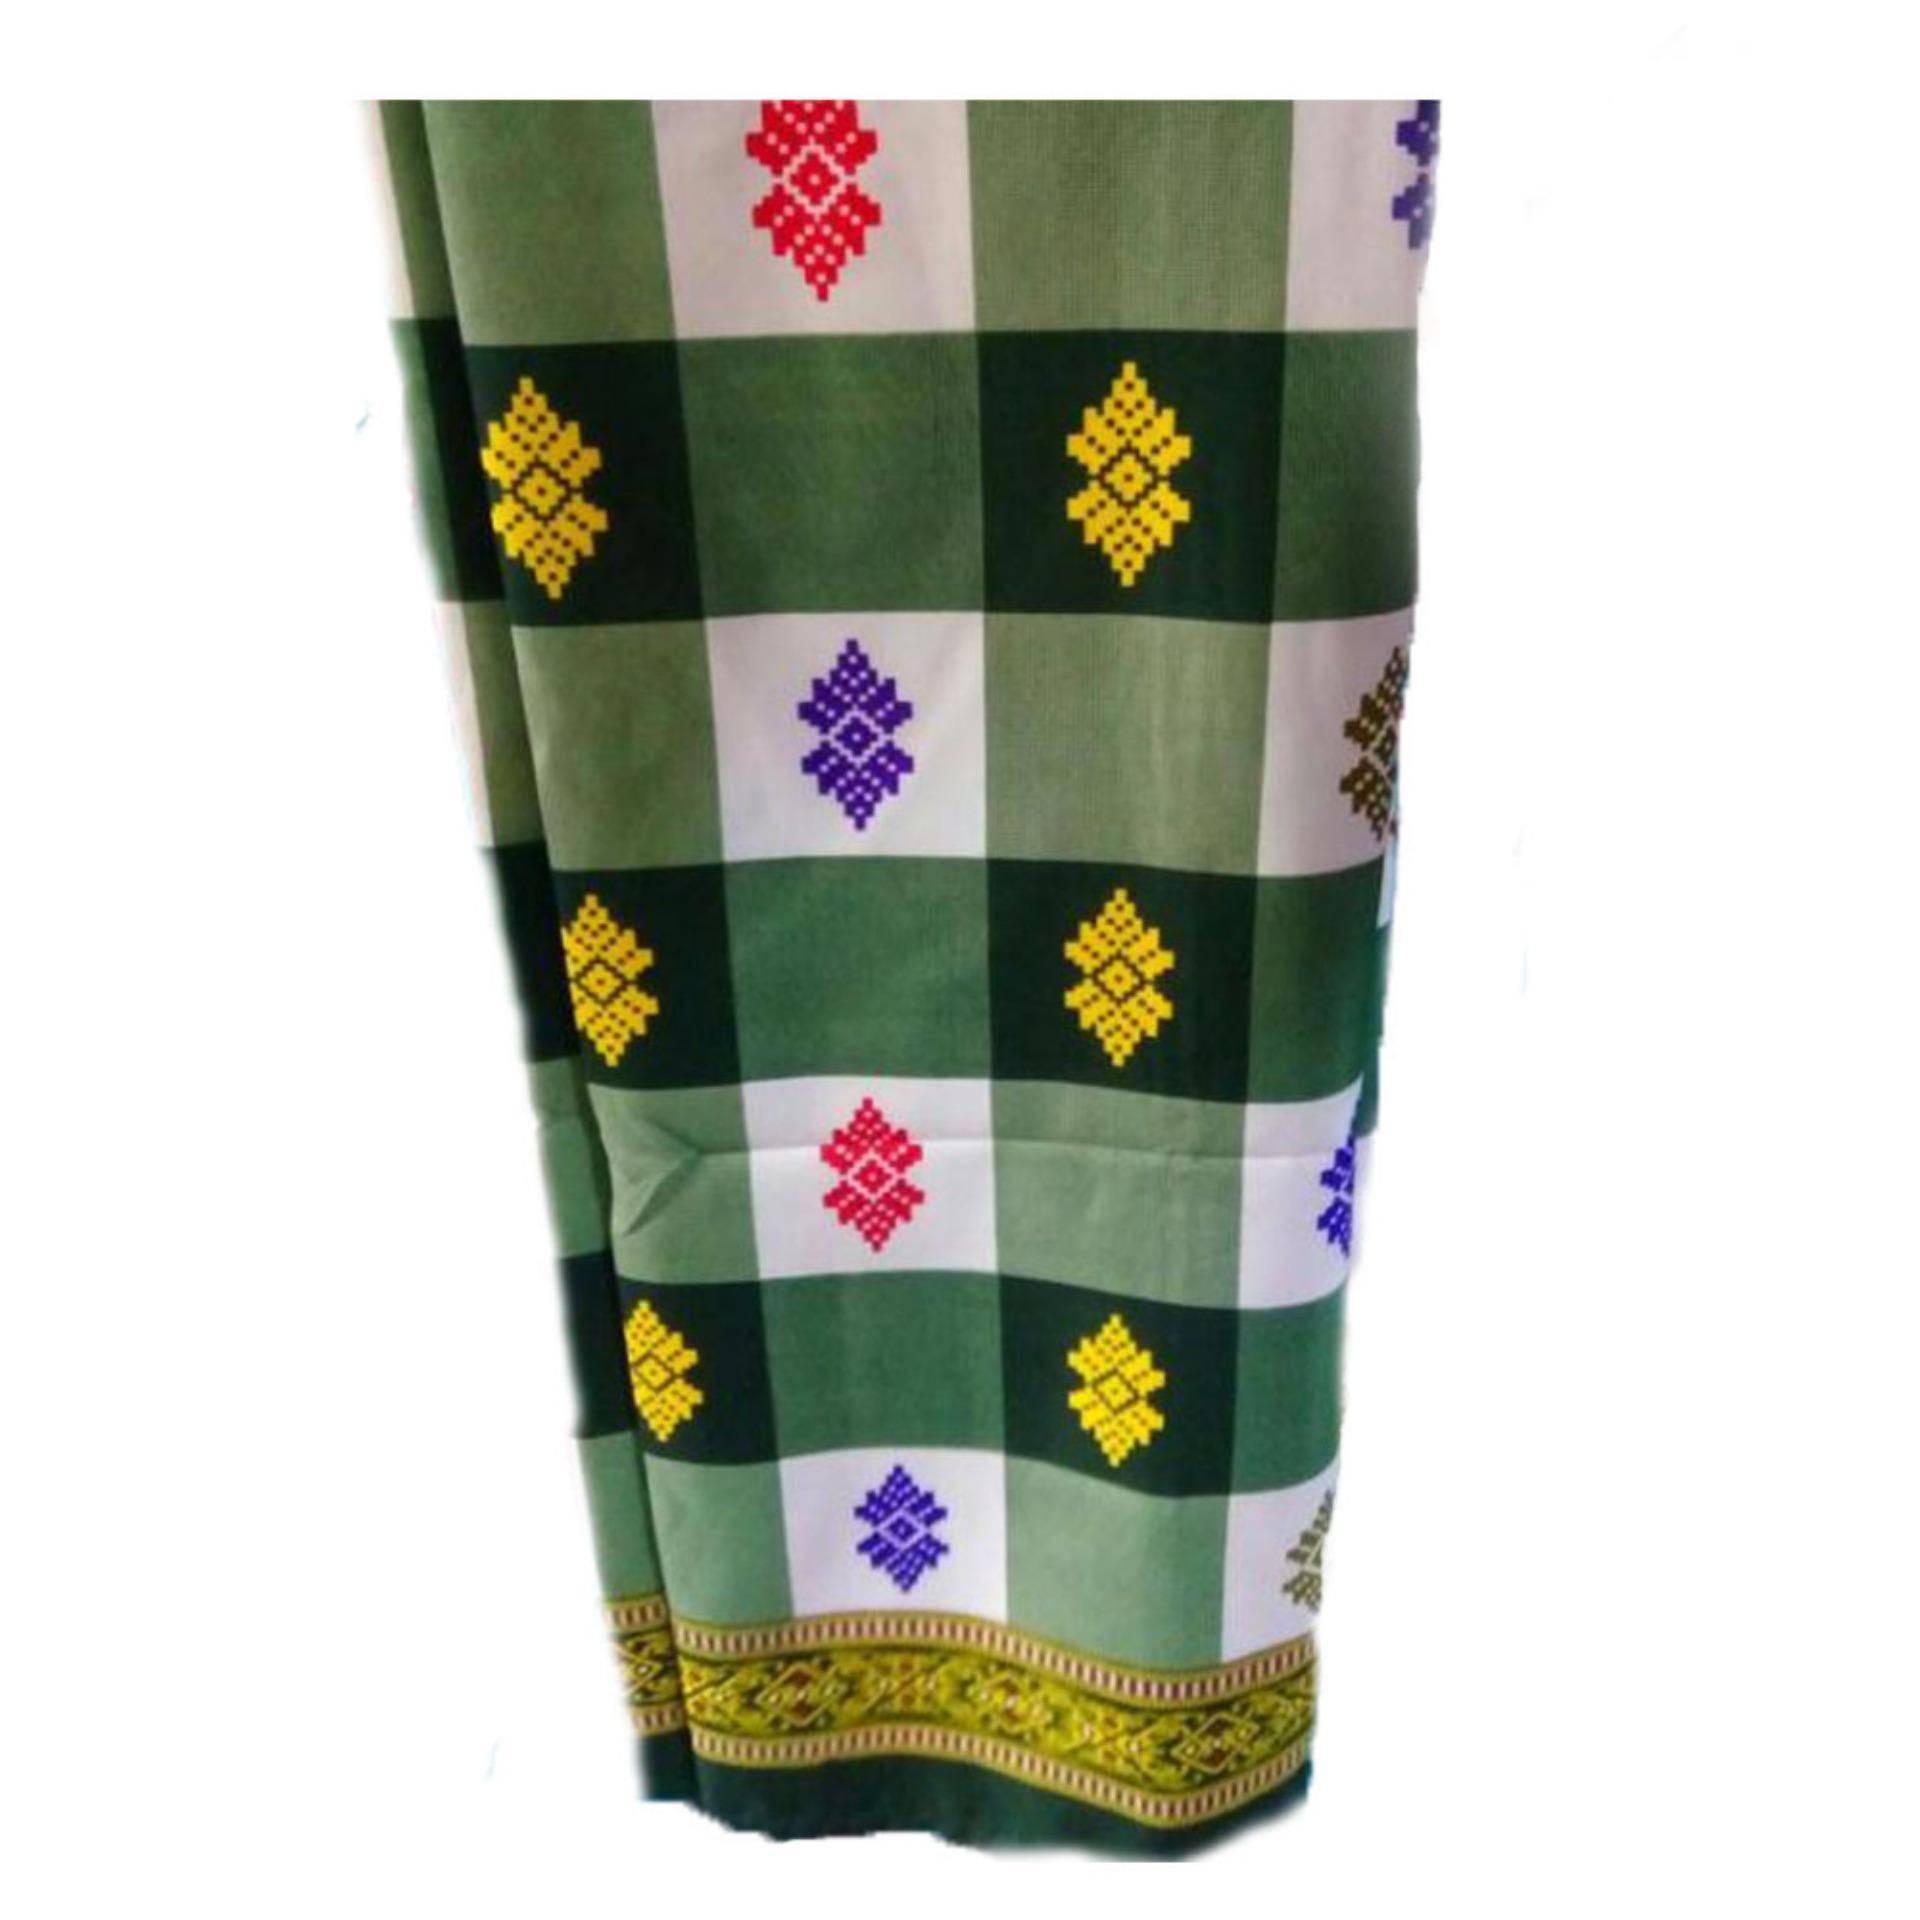 Sarung catur Jnanacrafts motif Bali